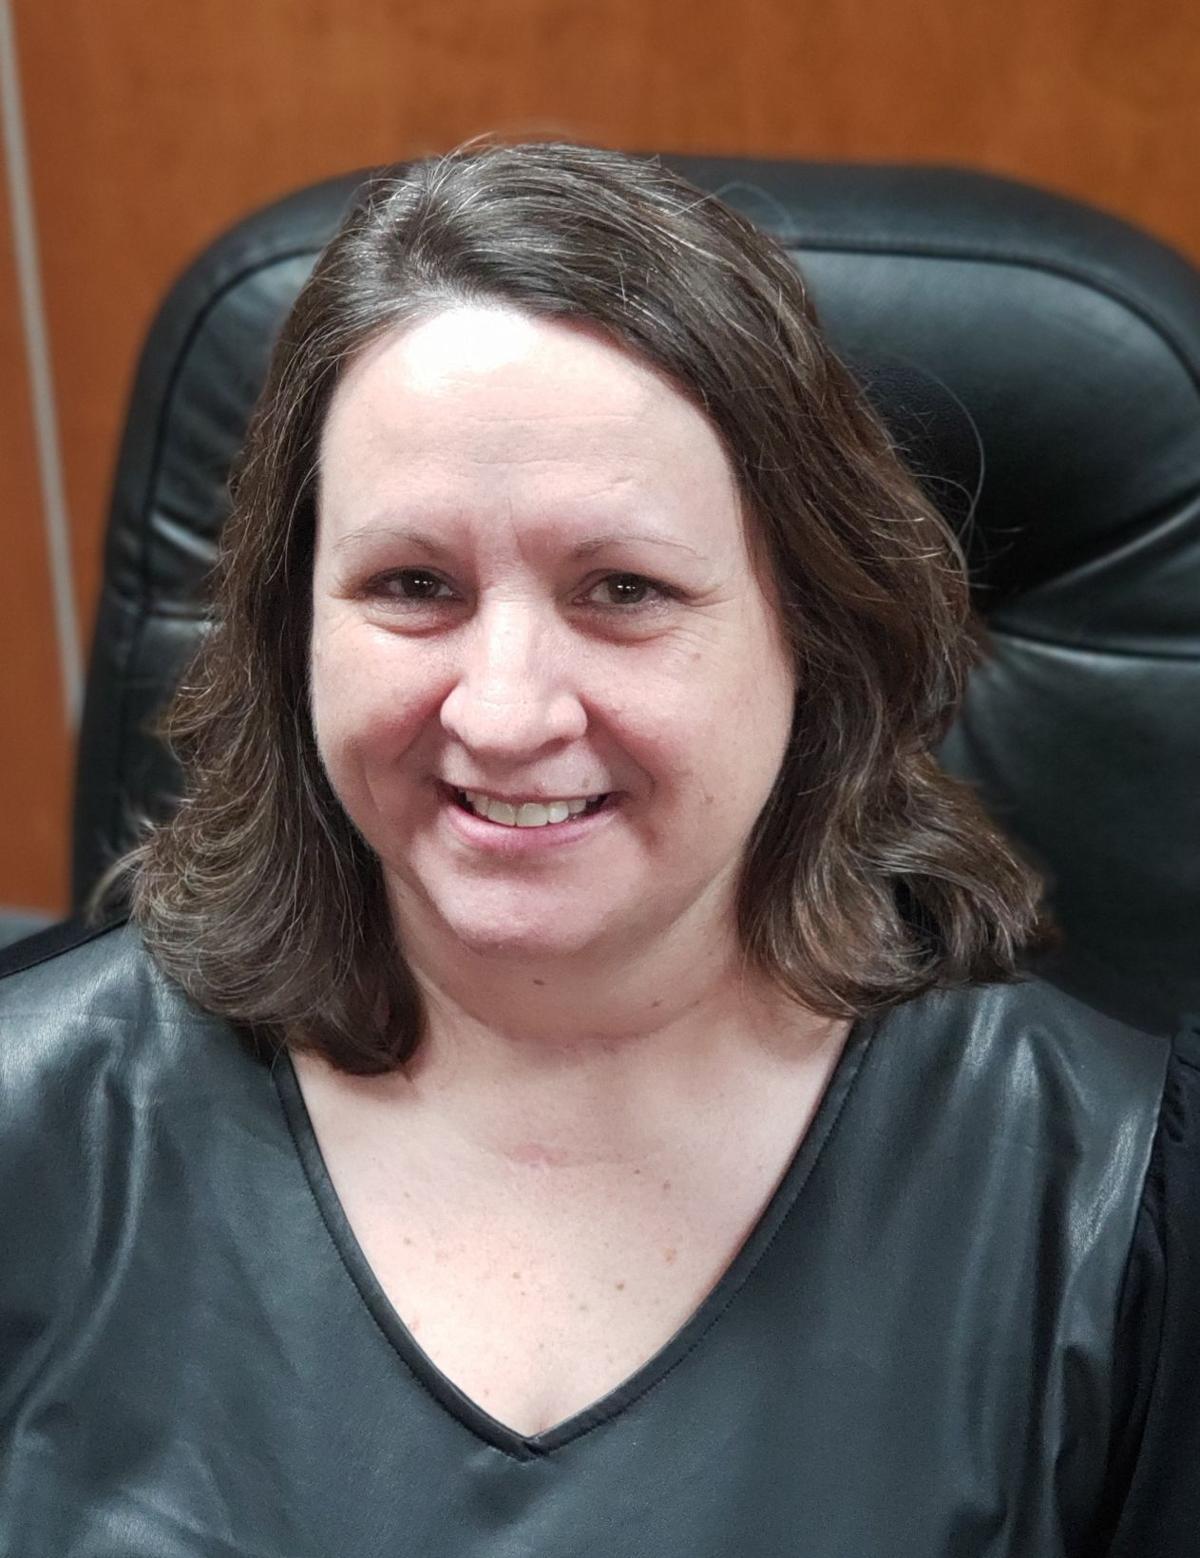 Daisy Huffman Forest City City Clerk